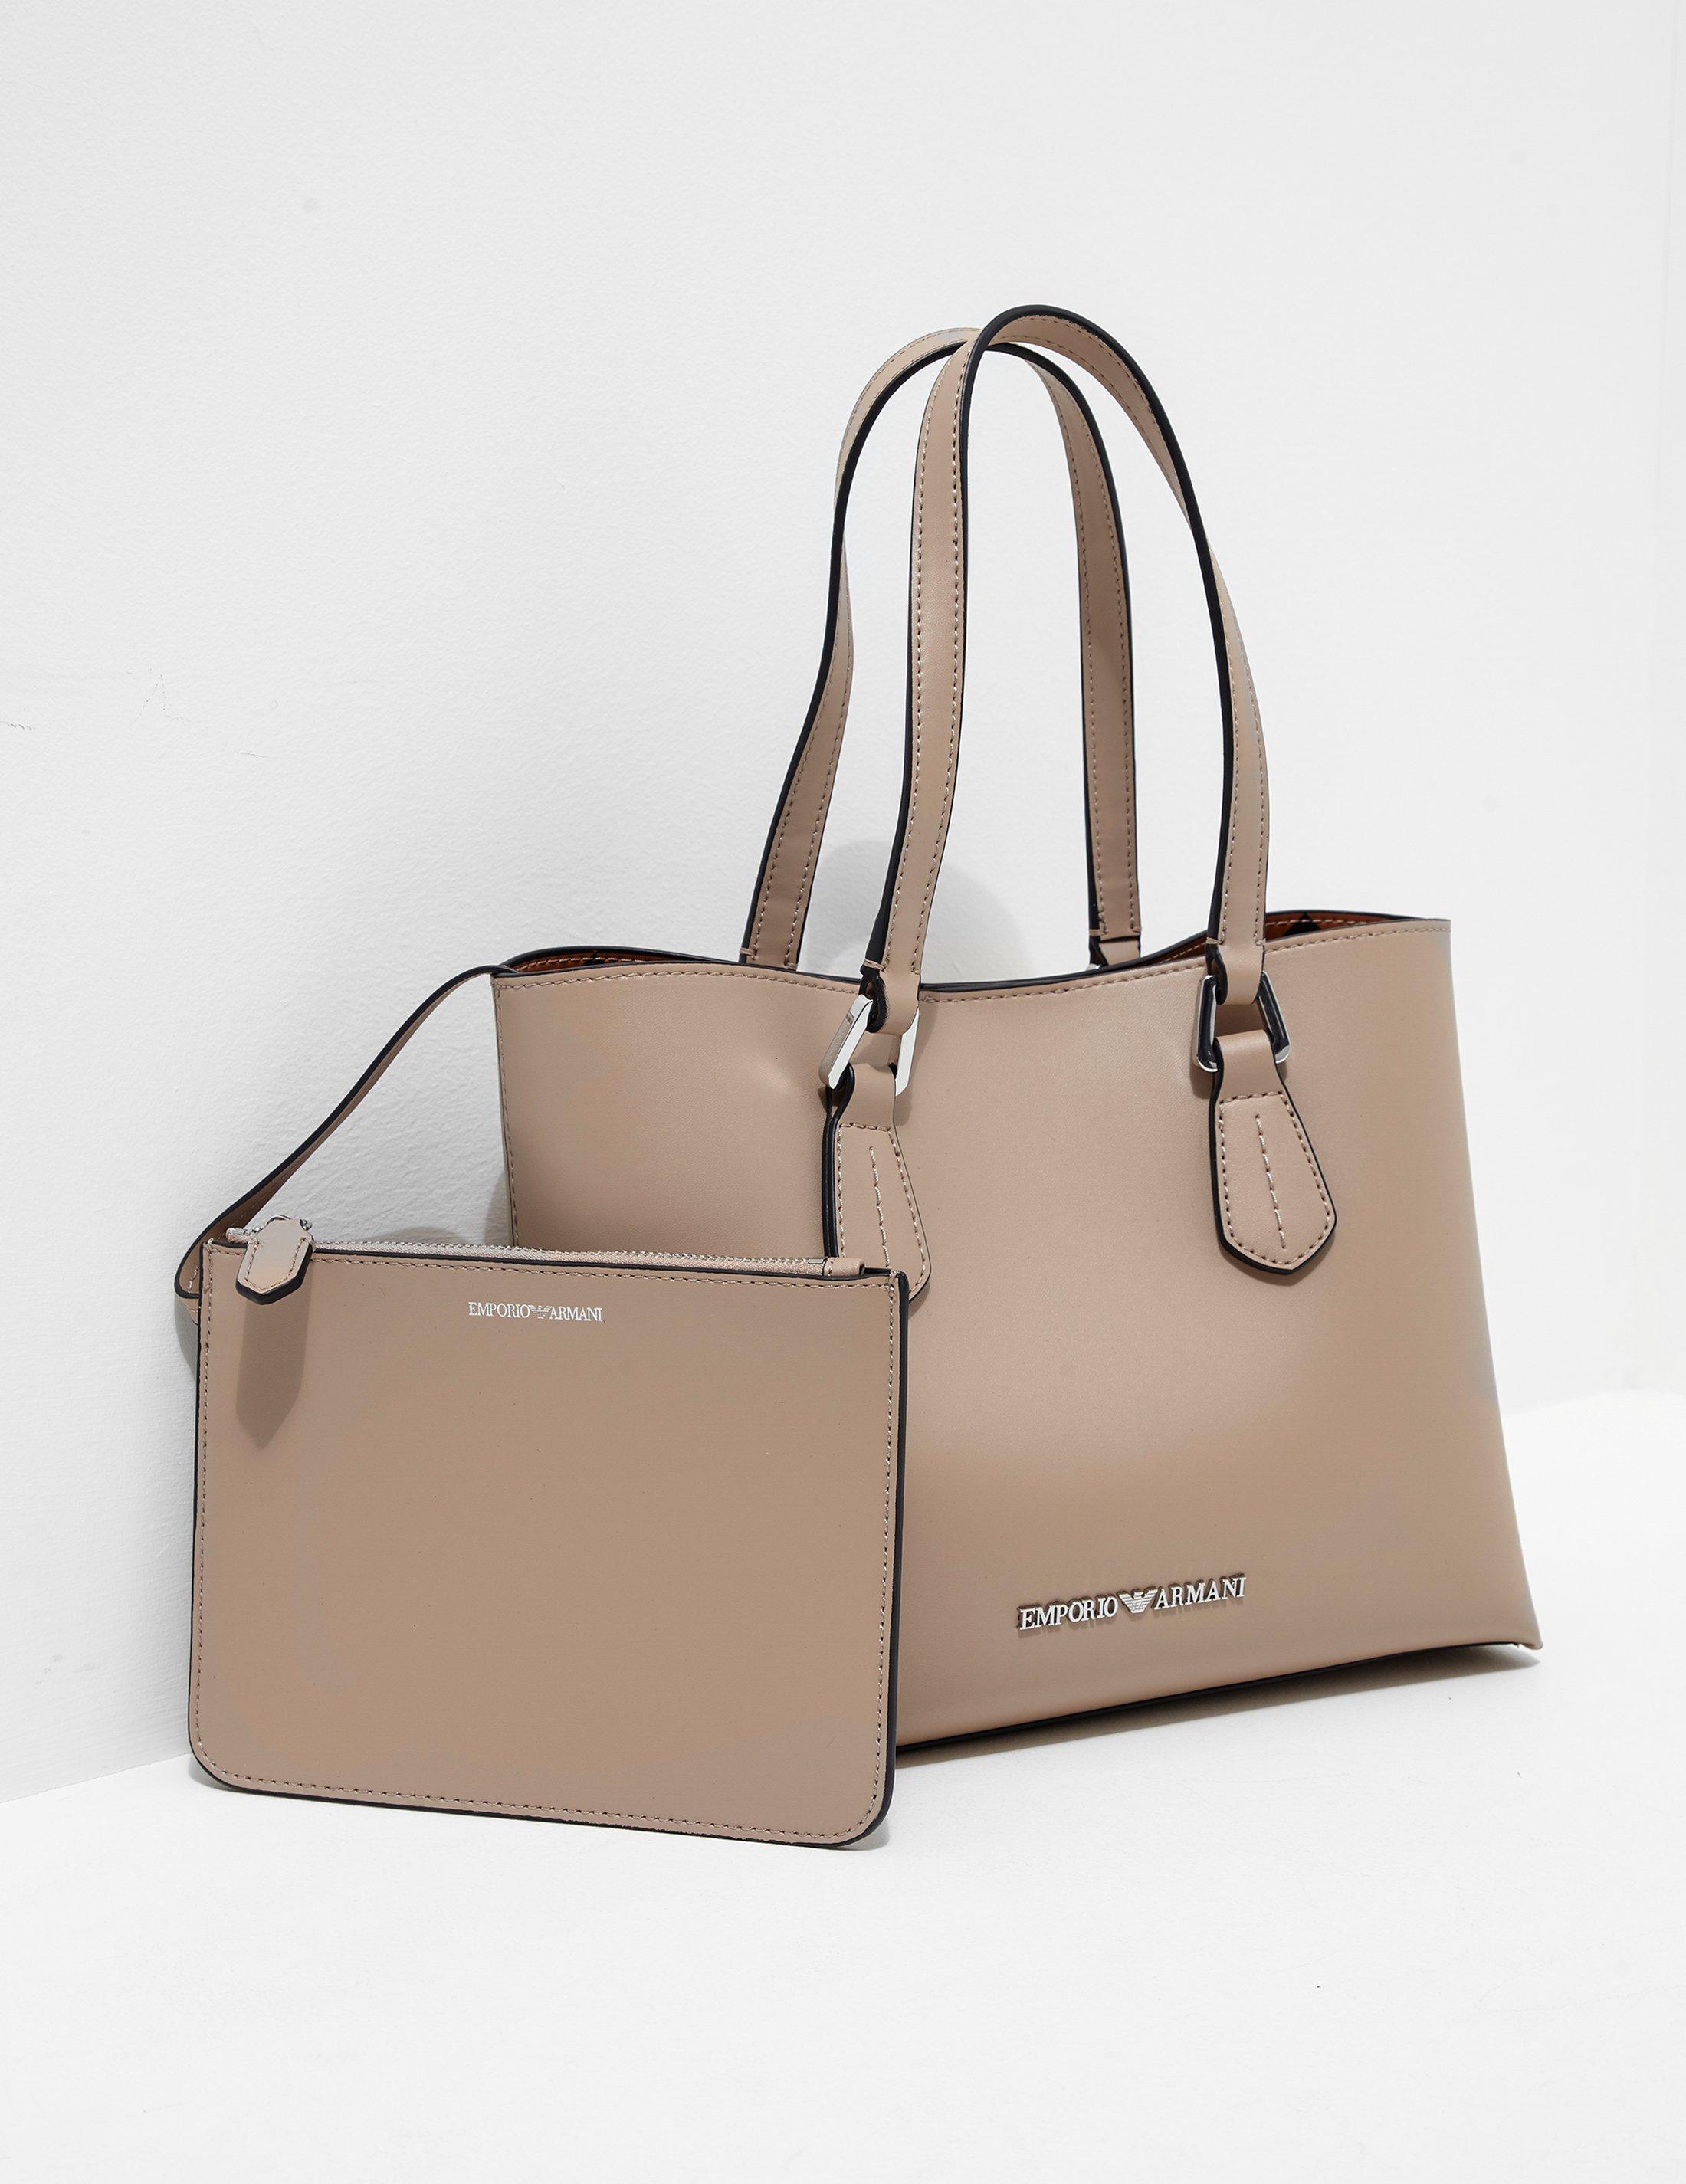 Emporio Armani Womens Wilma Medium Shopper Bag Beige in Natural - Lyst 5047cec43764c